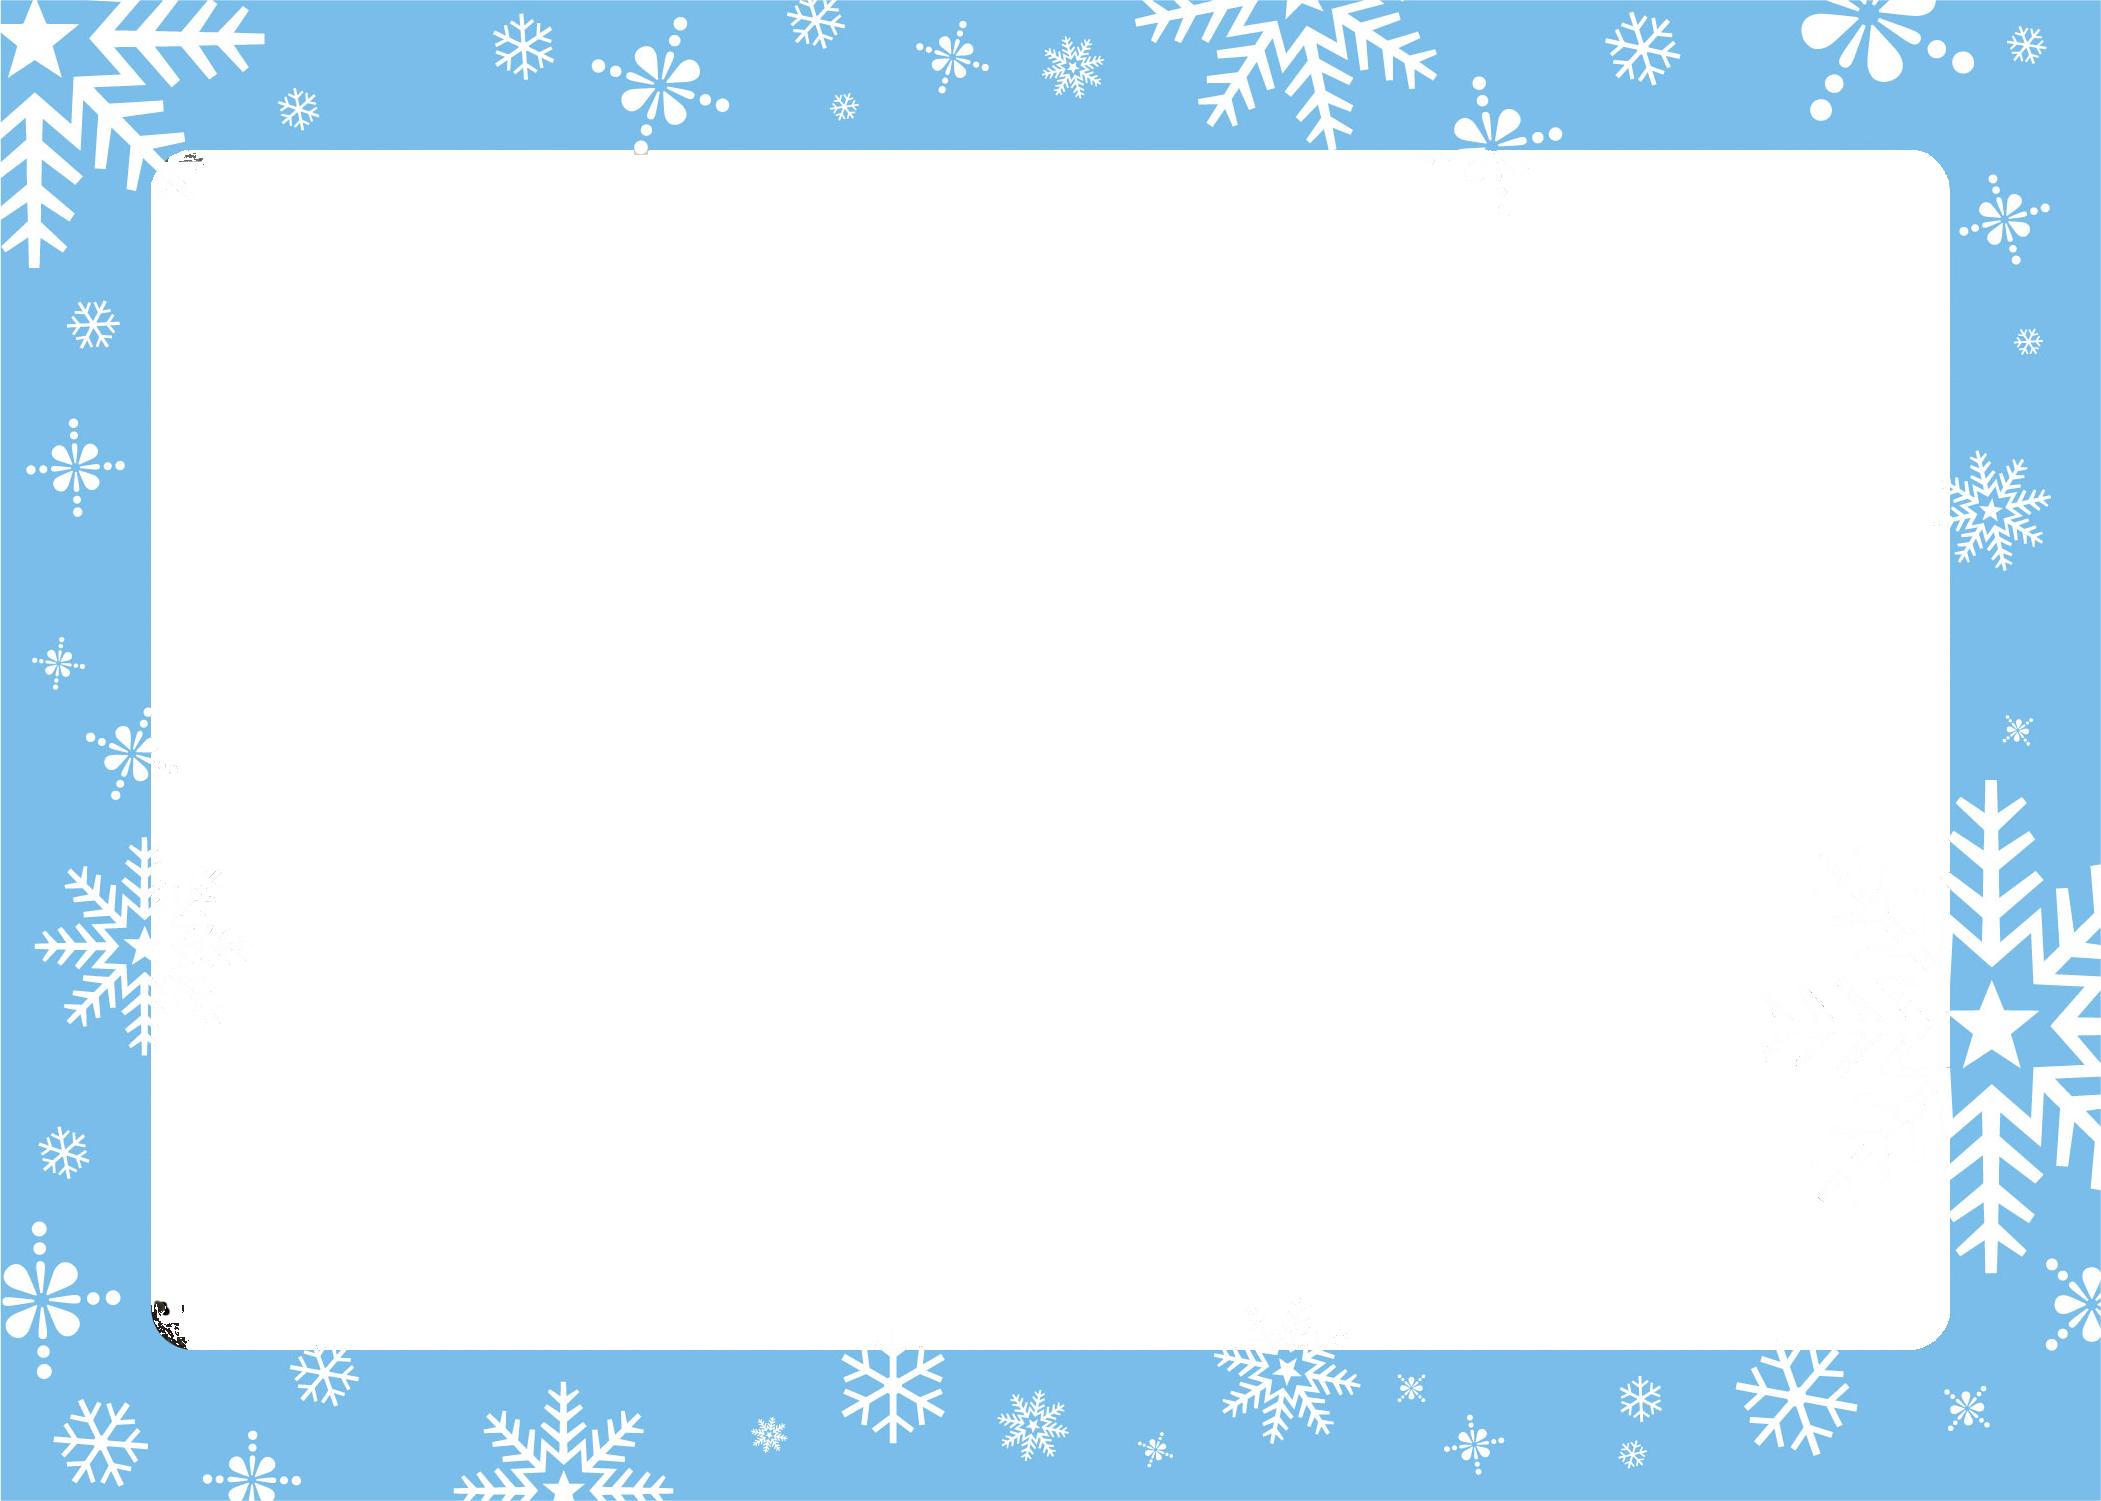 Snowflake clipart microsoft banner transparent download Winter Borders Microsoft Clipart #1916105 banner transparent download